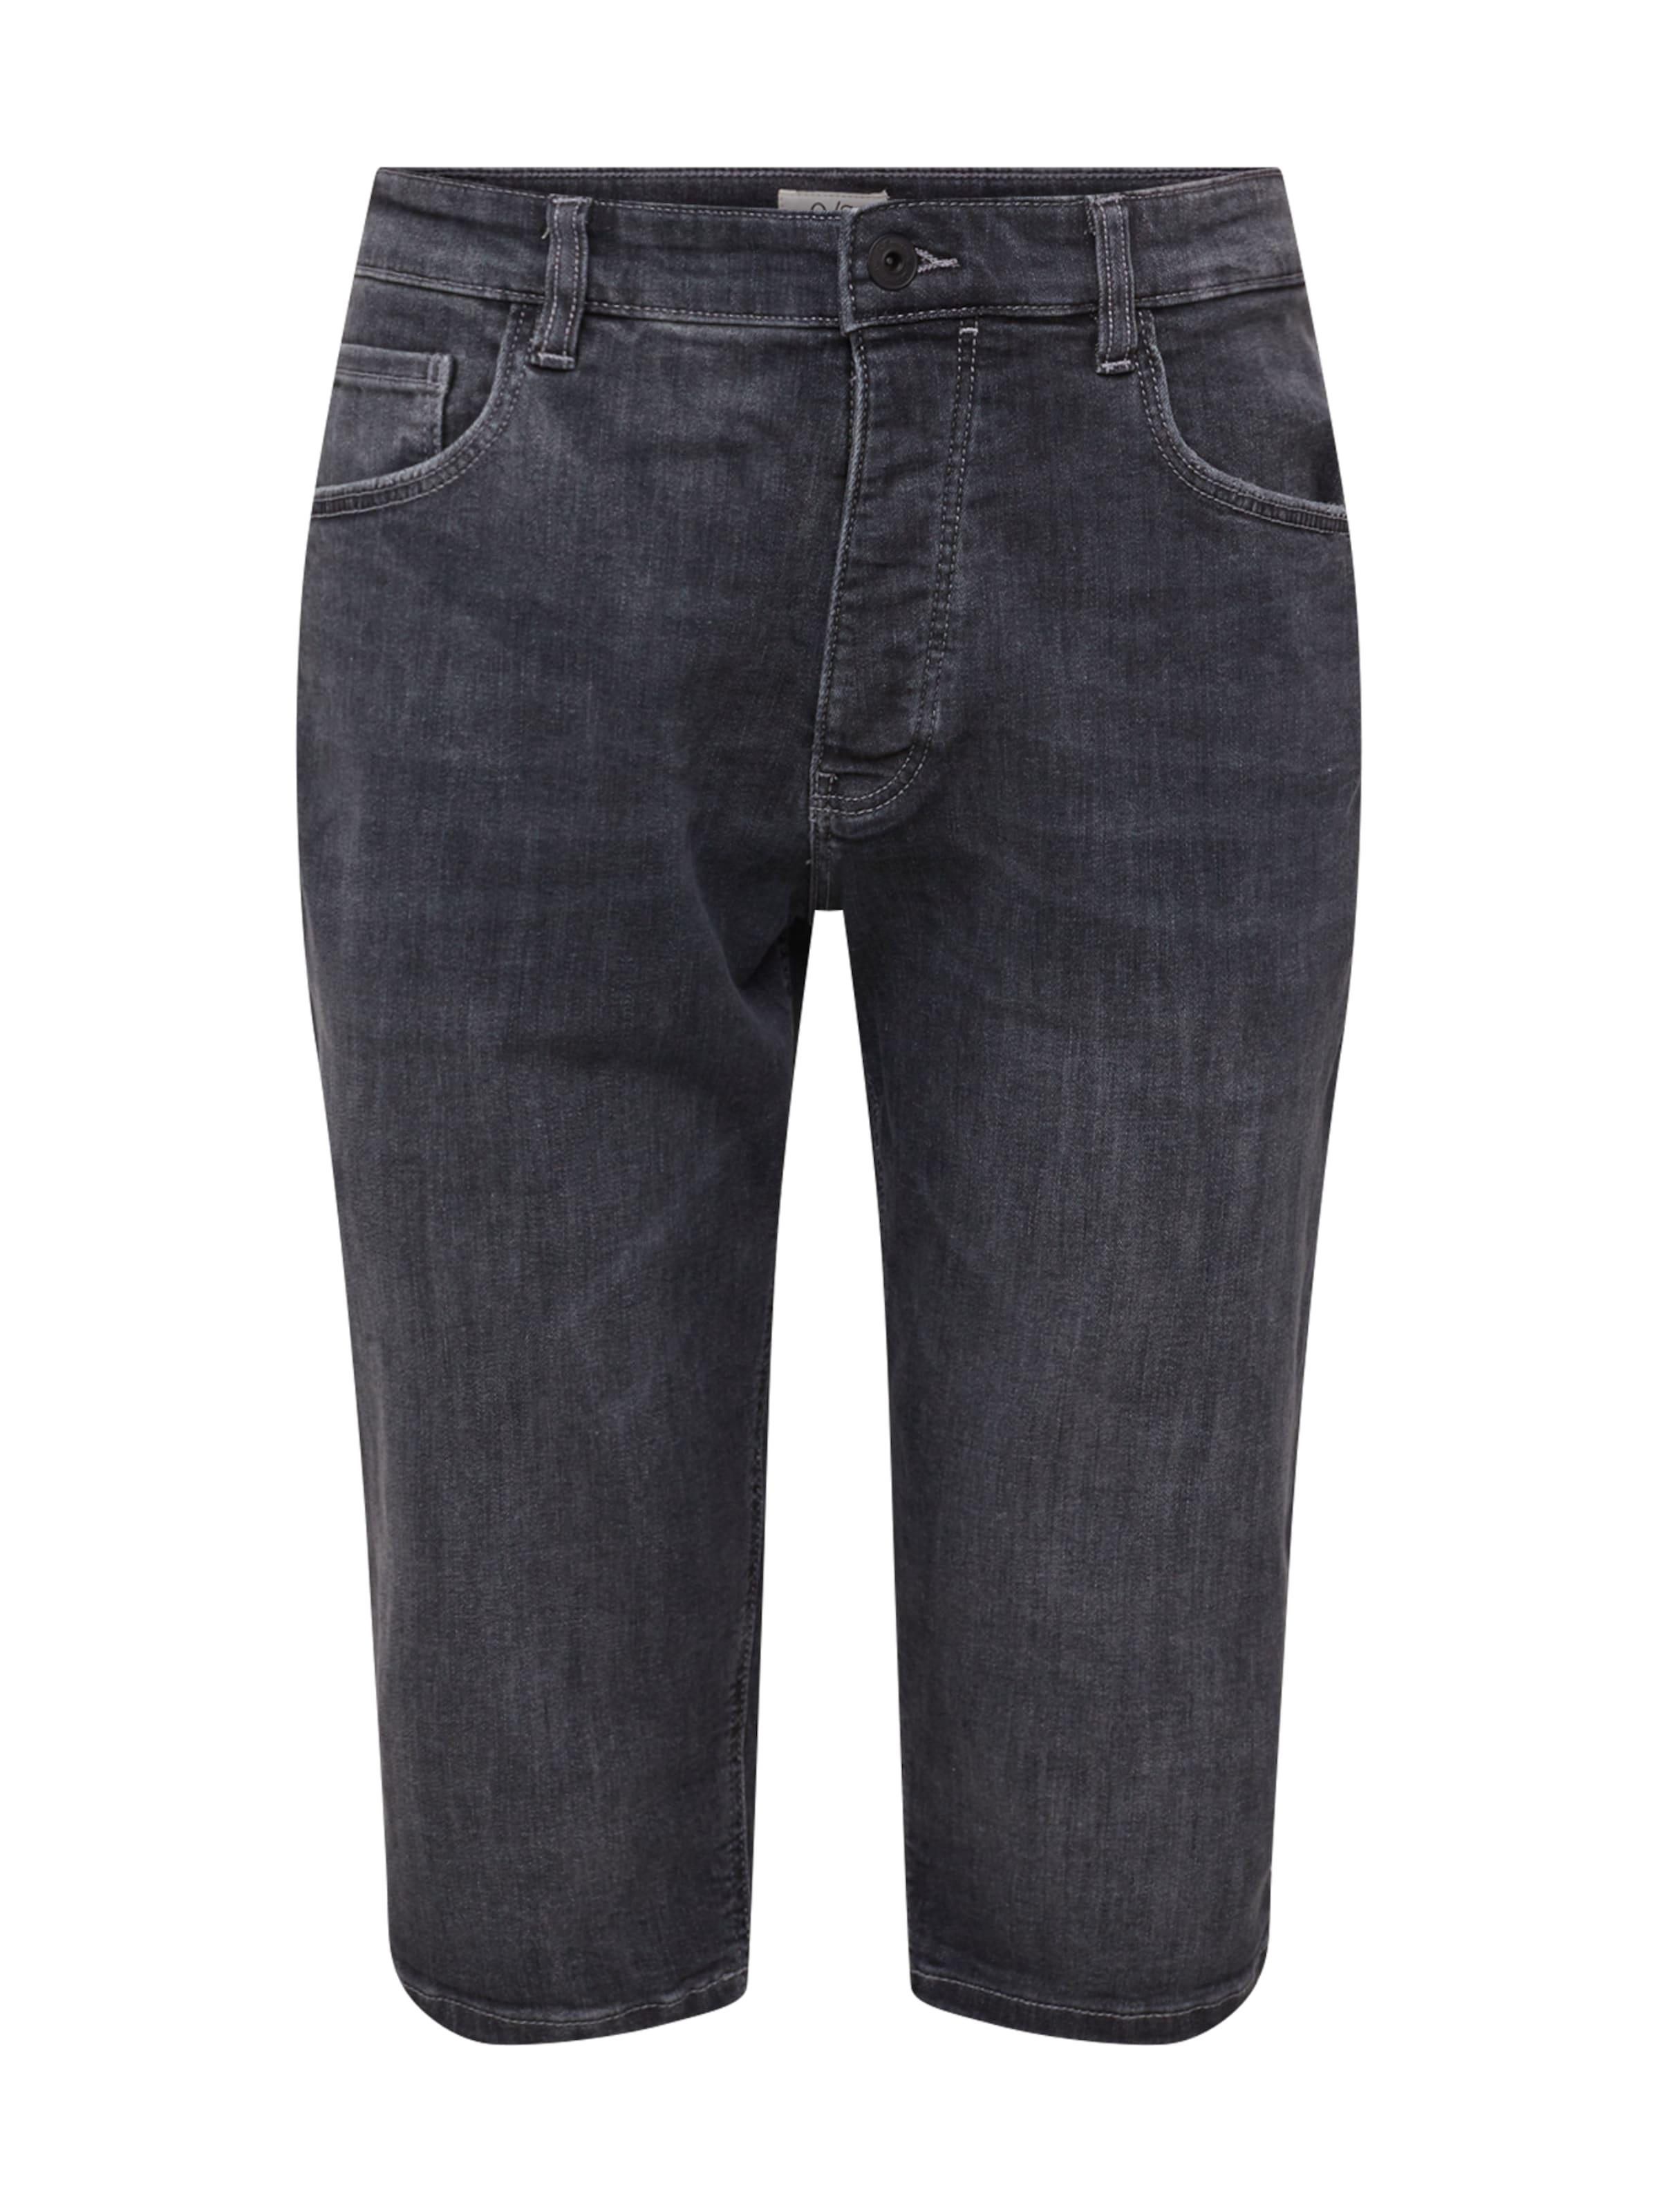 In Denim s Grey Q Designed By Jeans BdoerWCx